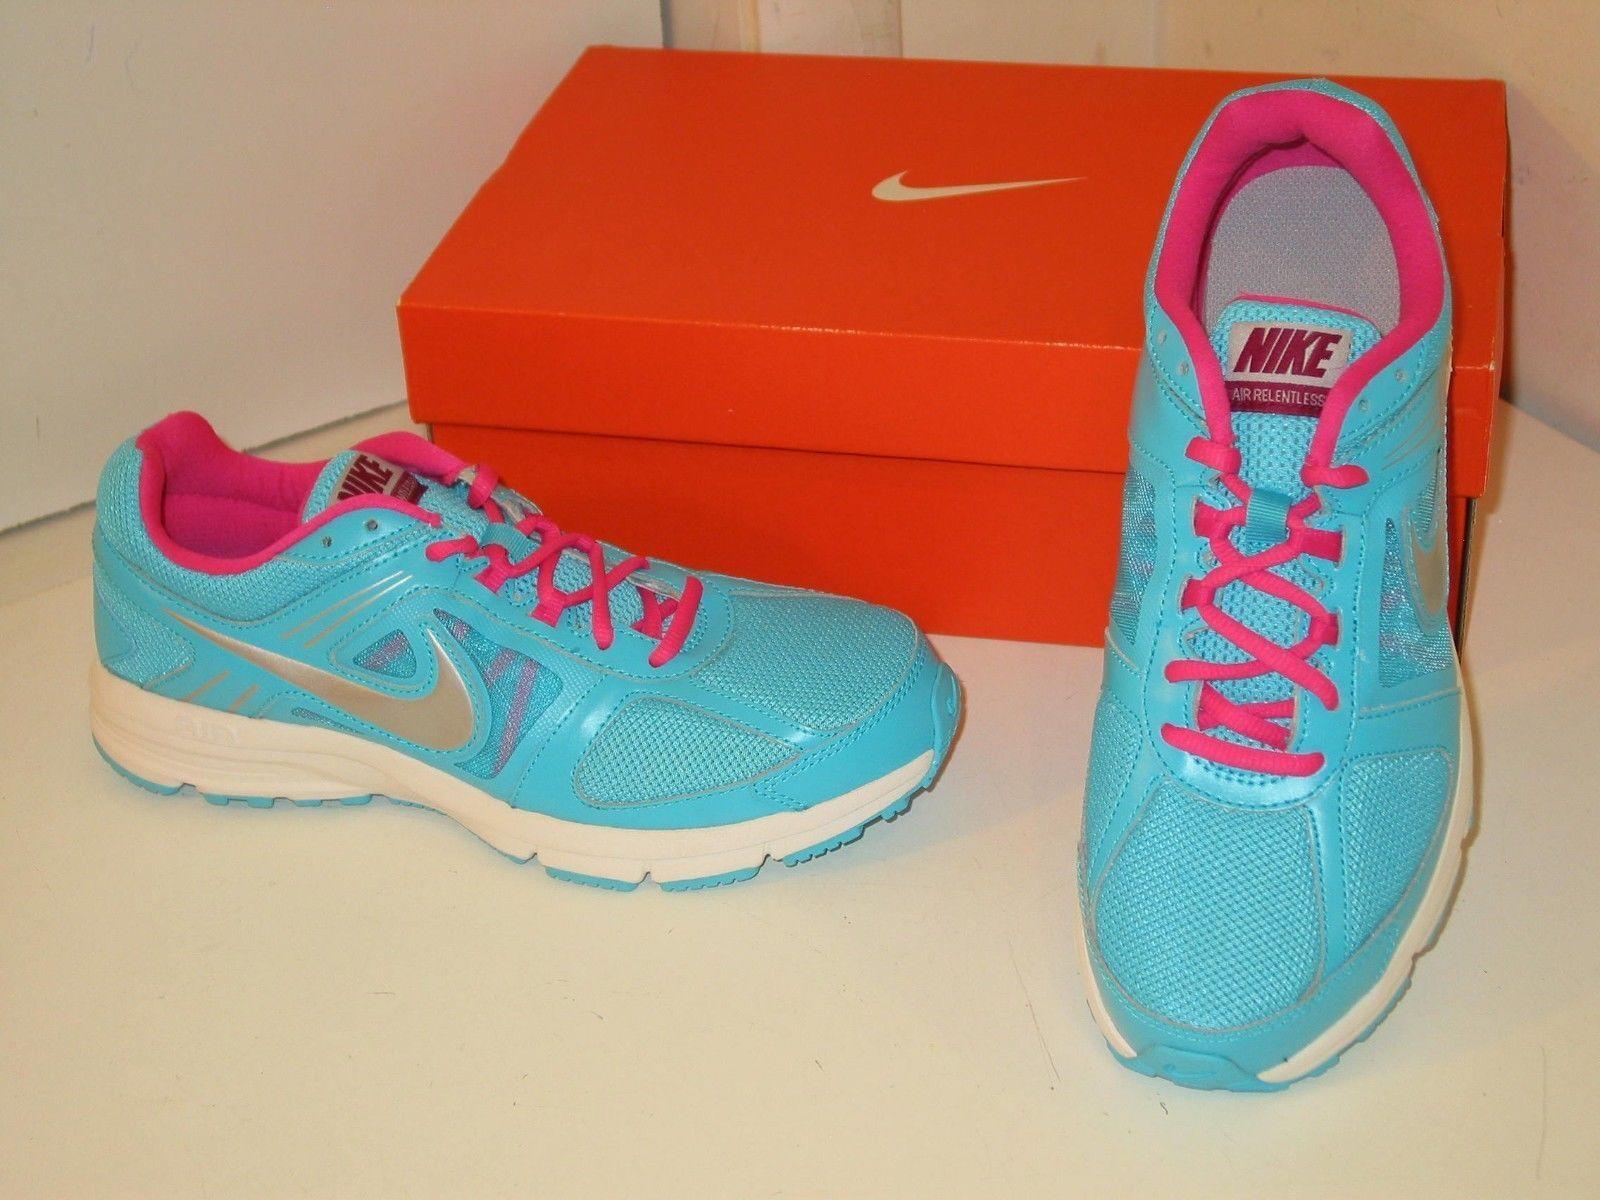 Nike Air Relentless 3 Running Cross Training Blue Mesh Sneakers Shoes Womens 6.5